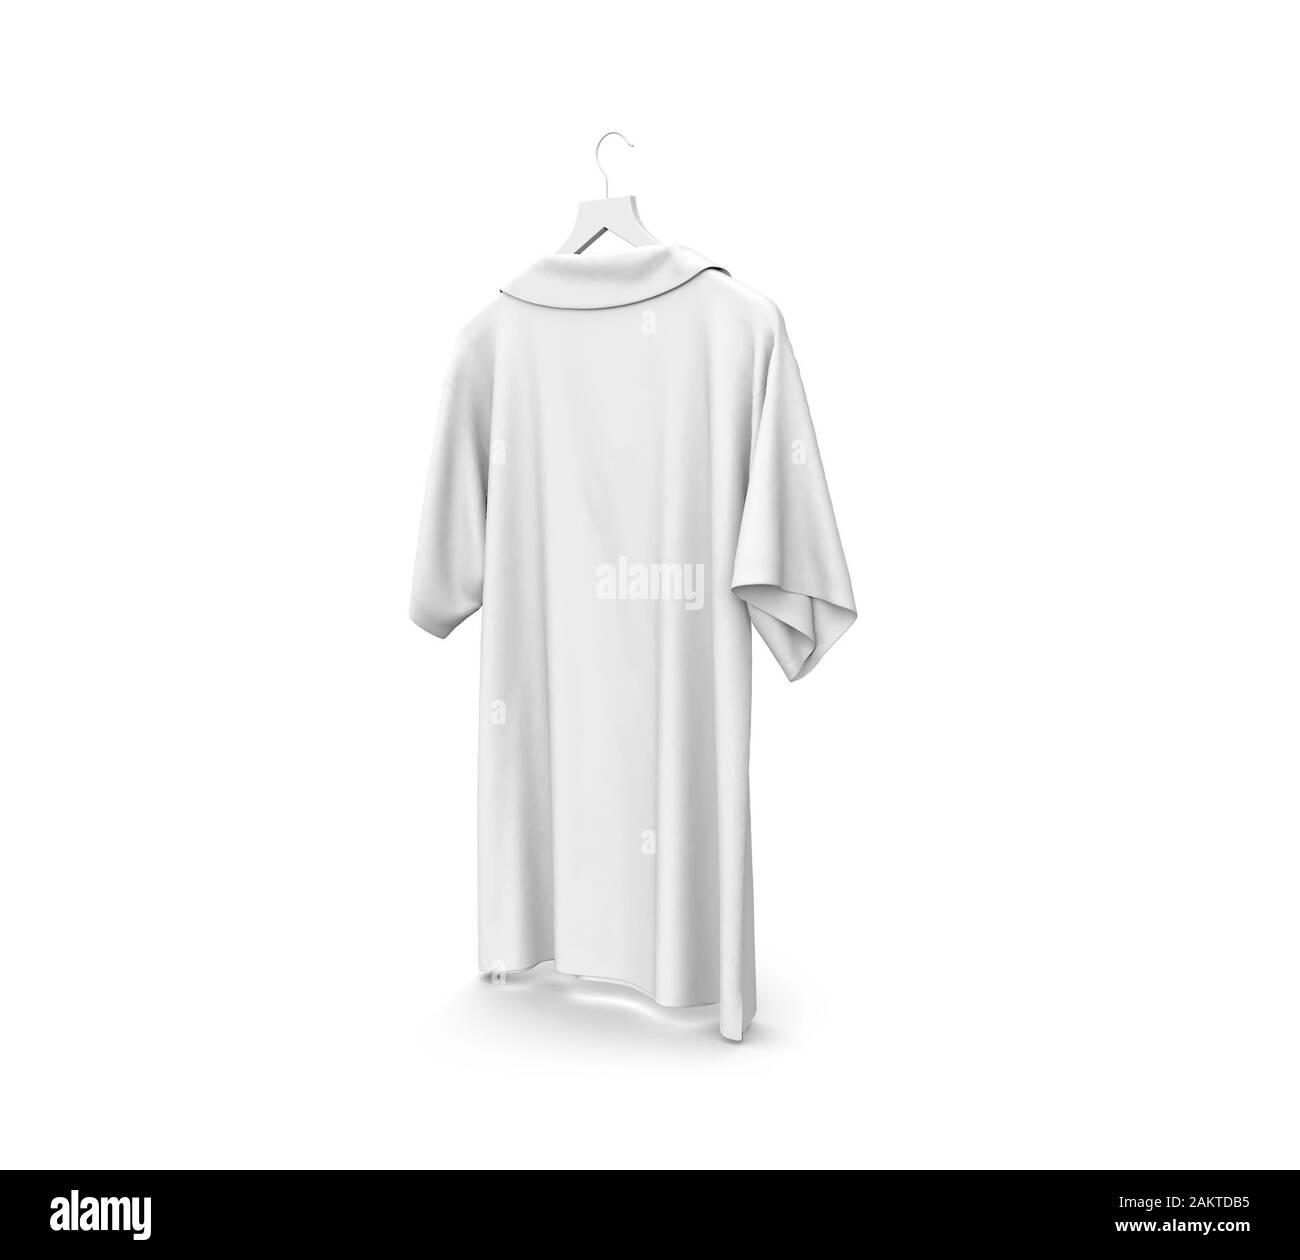 Blank White Polo Shirt Mockup Clear Male White Polo Shirt Mockup